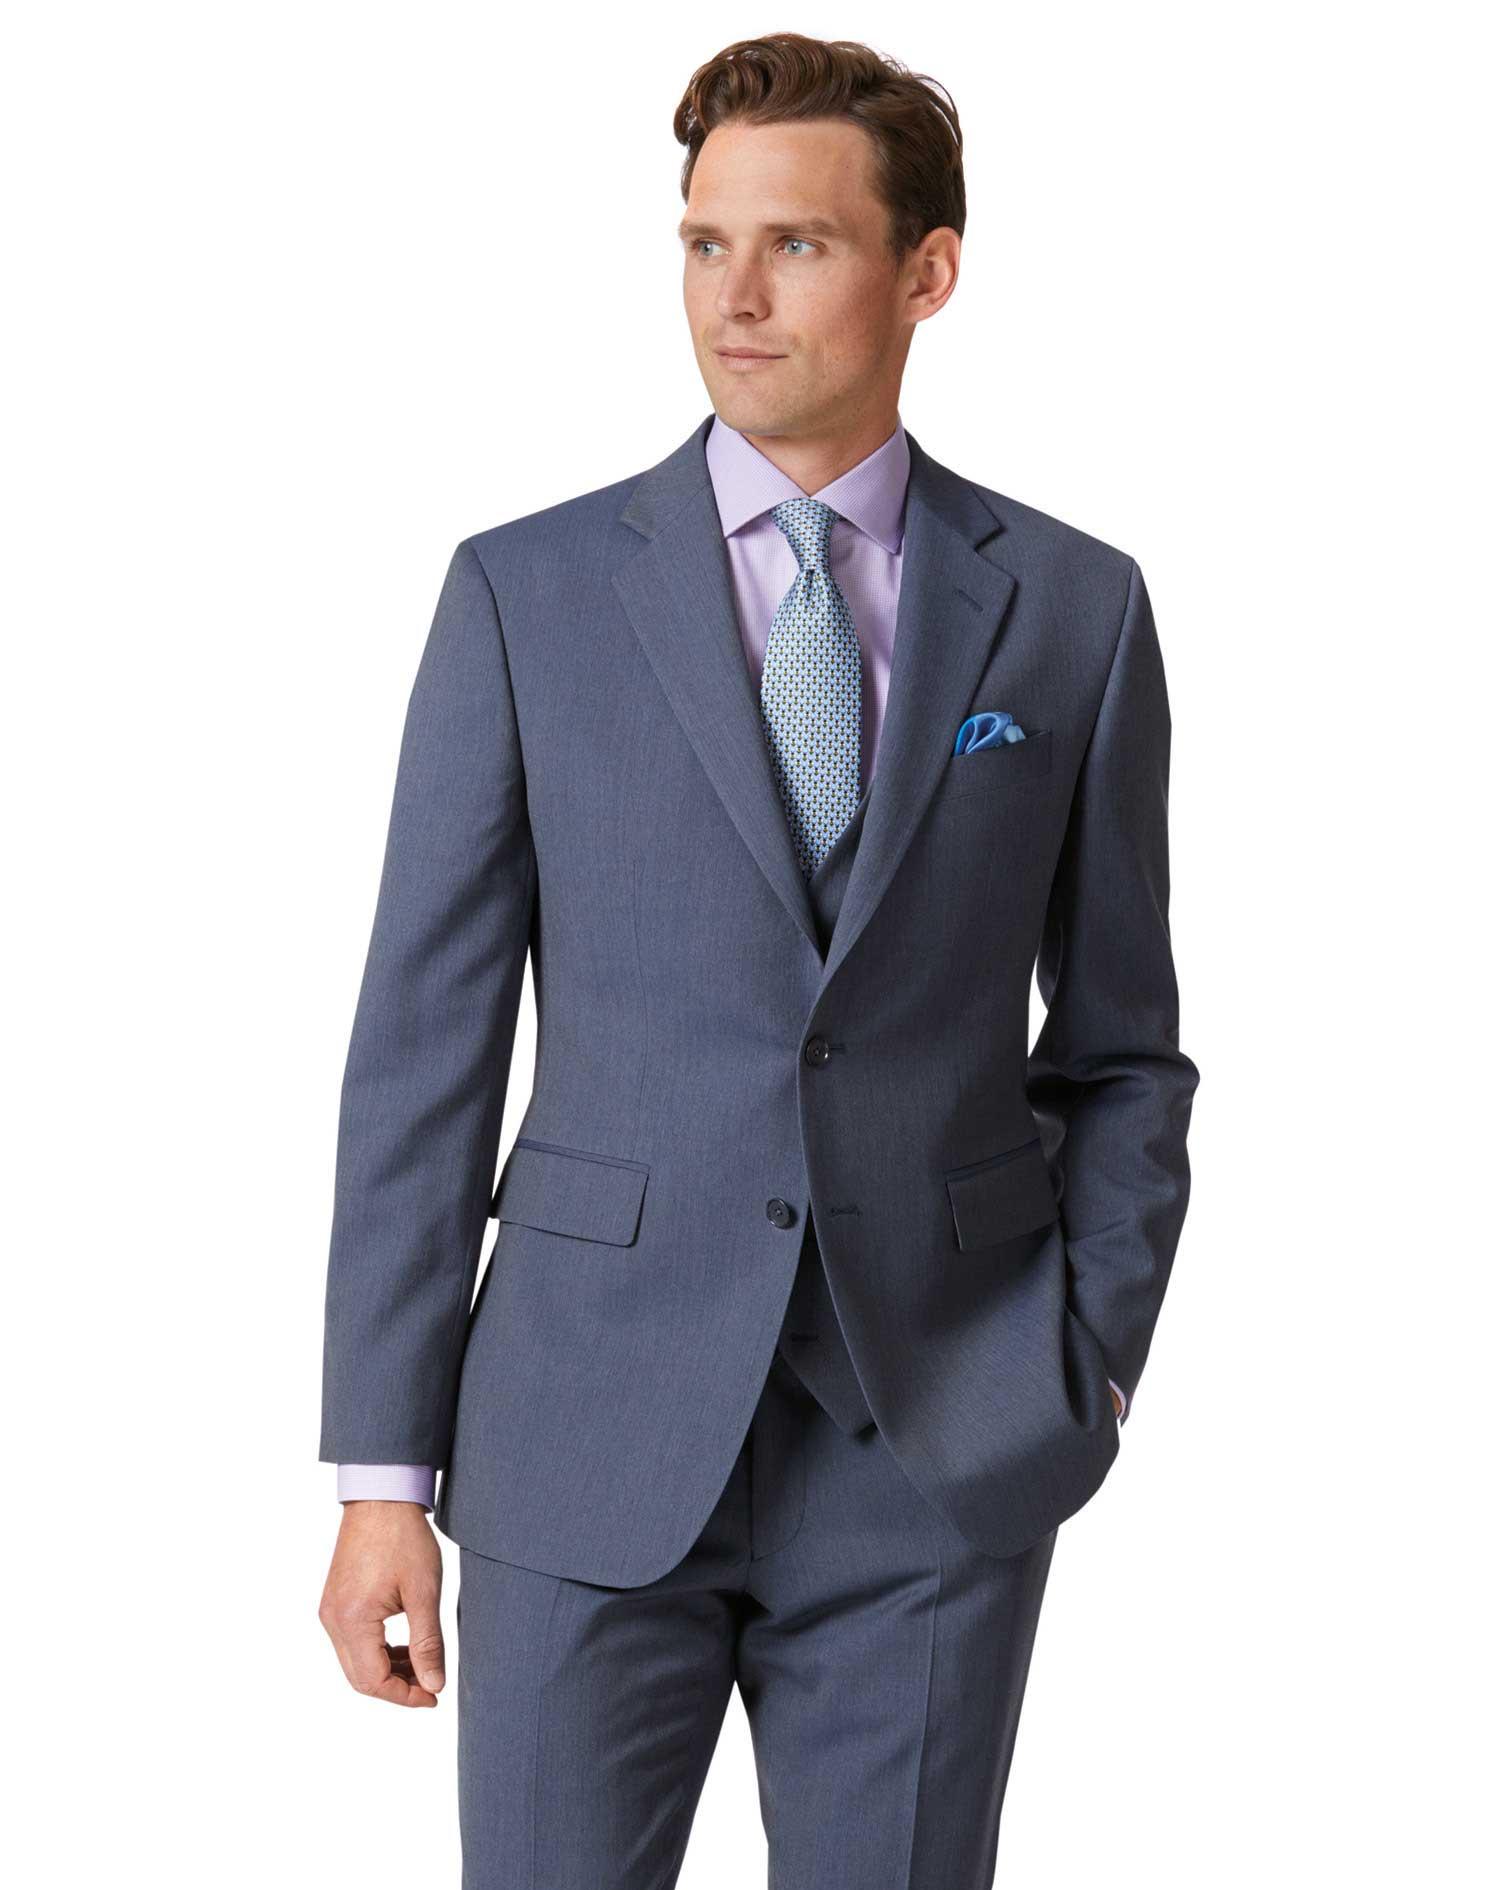 Light Blue Slim Fit Herringbone Business Suit Wool Jacket Size 42 Short by Charles Tyrwhitt